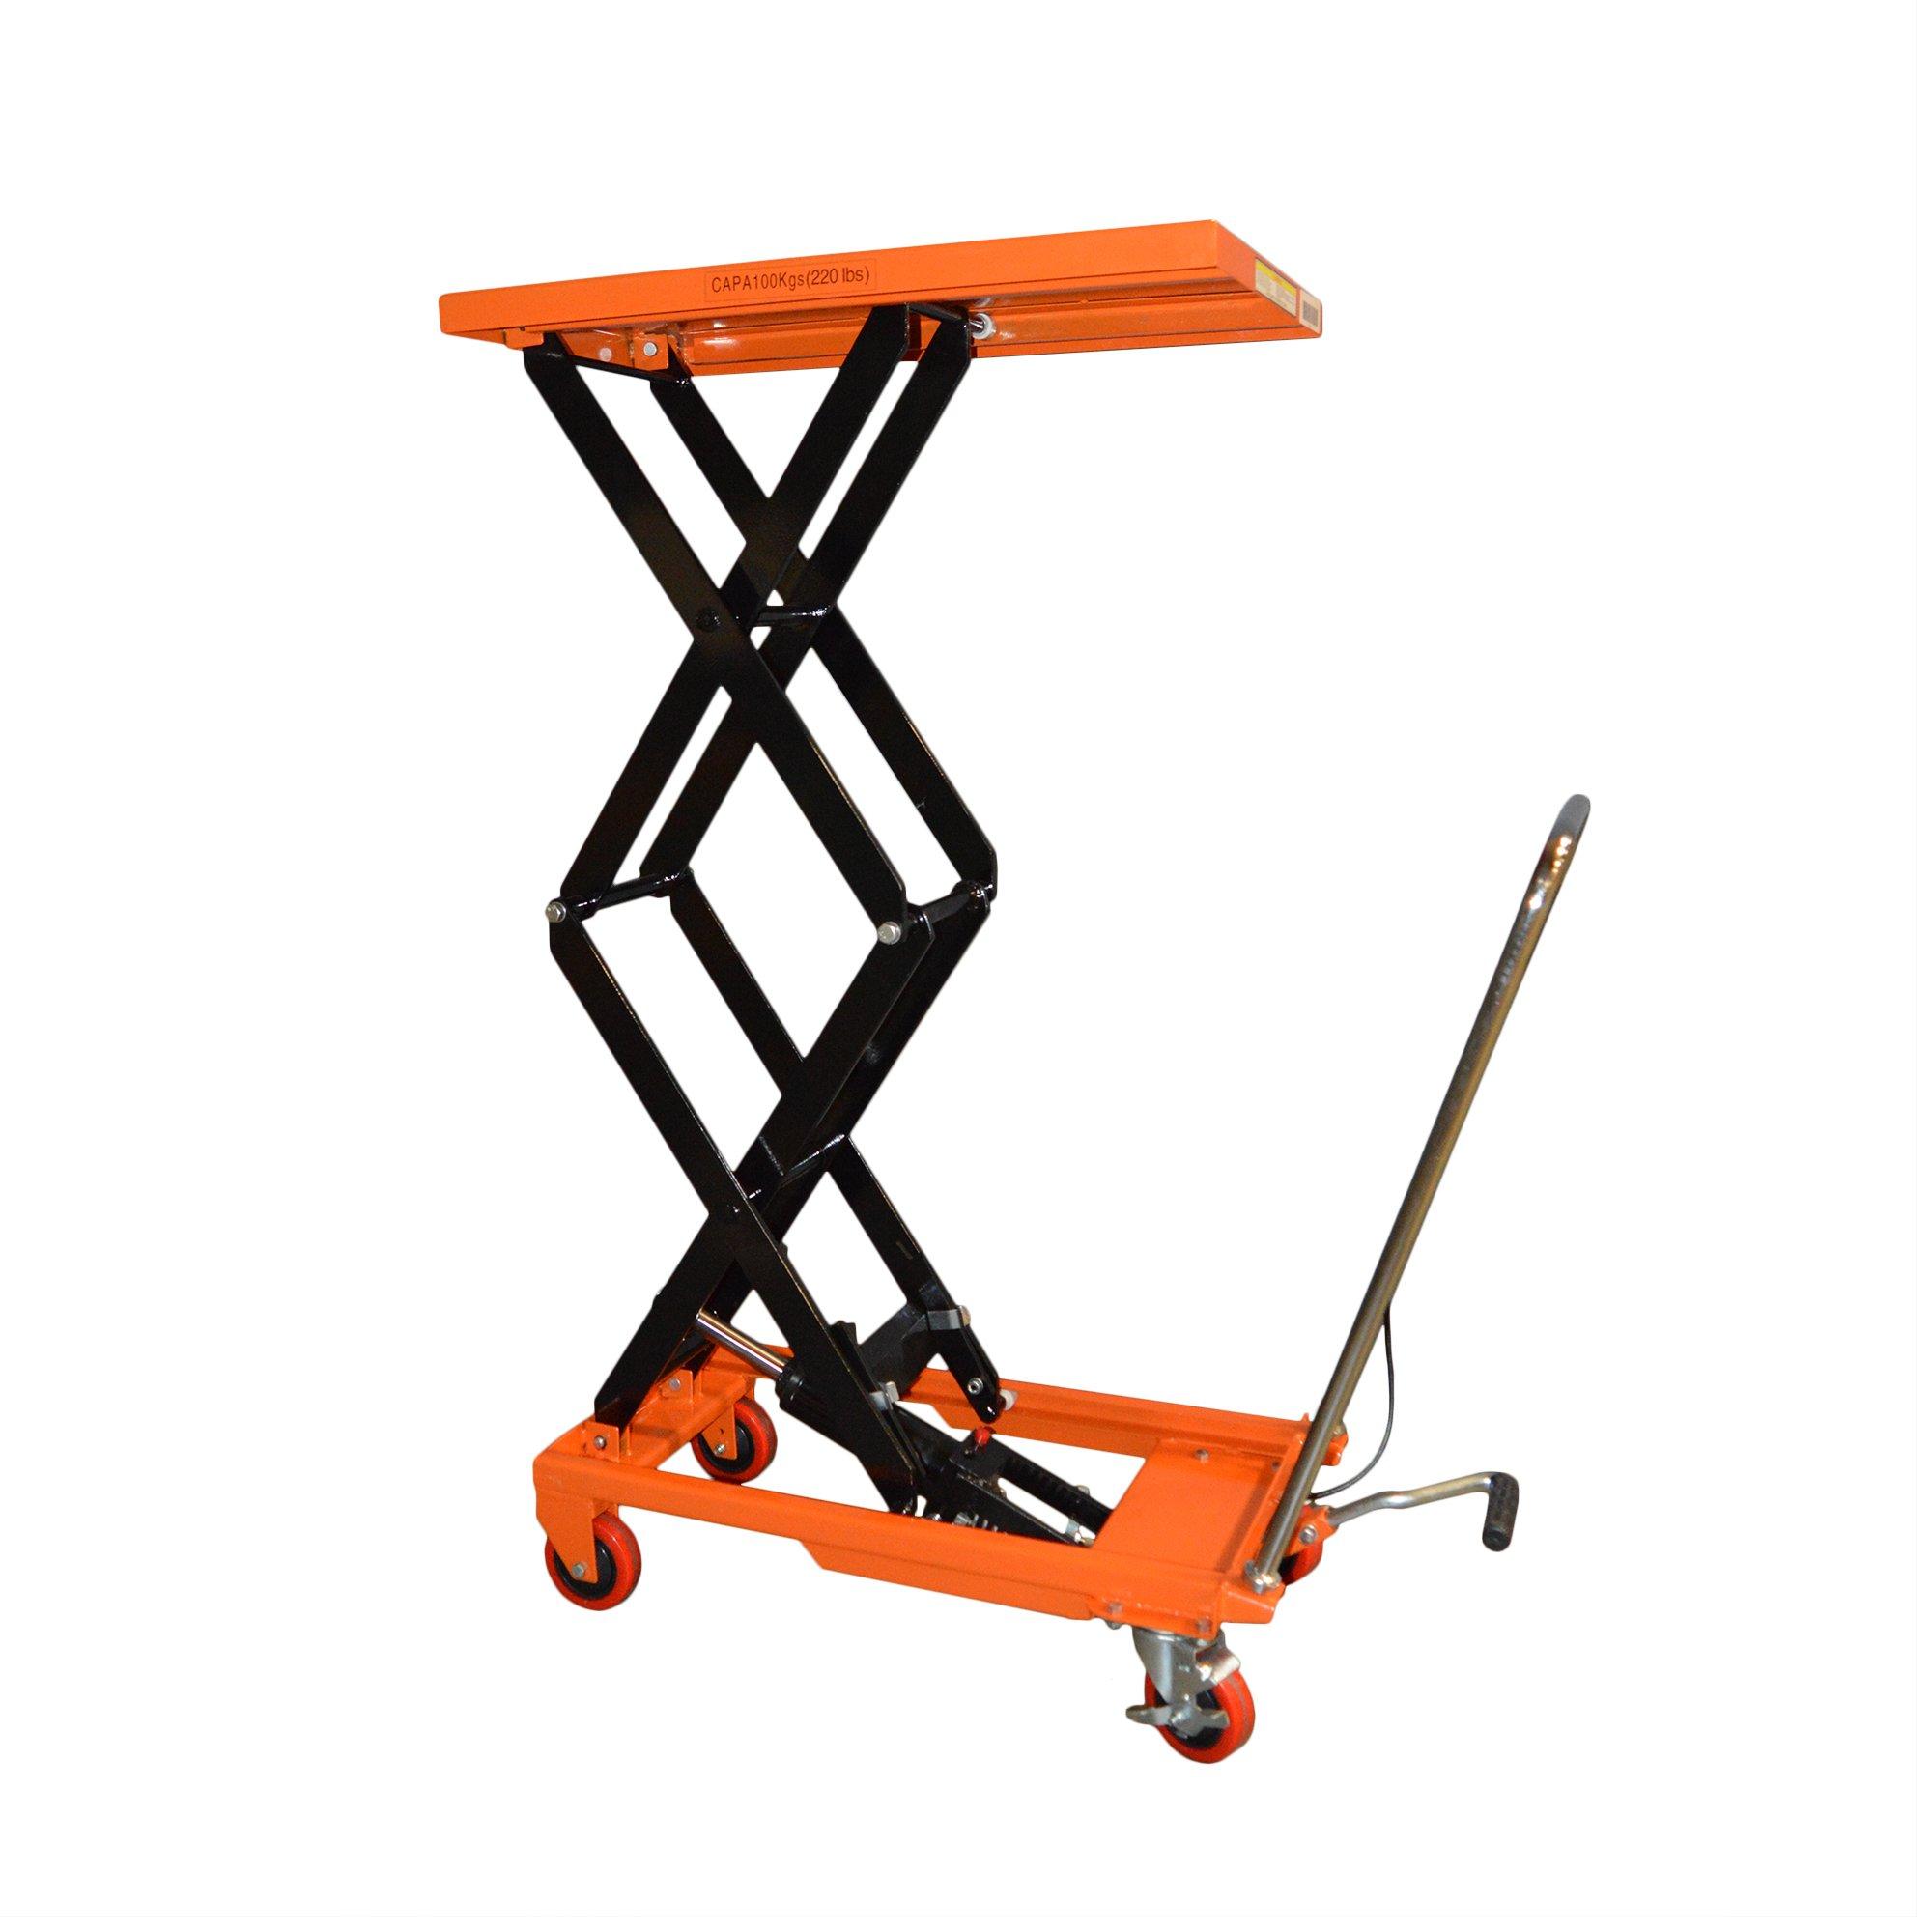 Bolton Tools Hydraulic Double Scissor Lift Table Cart |TF10